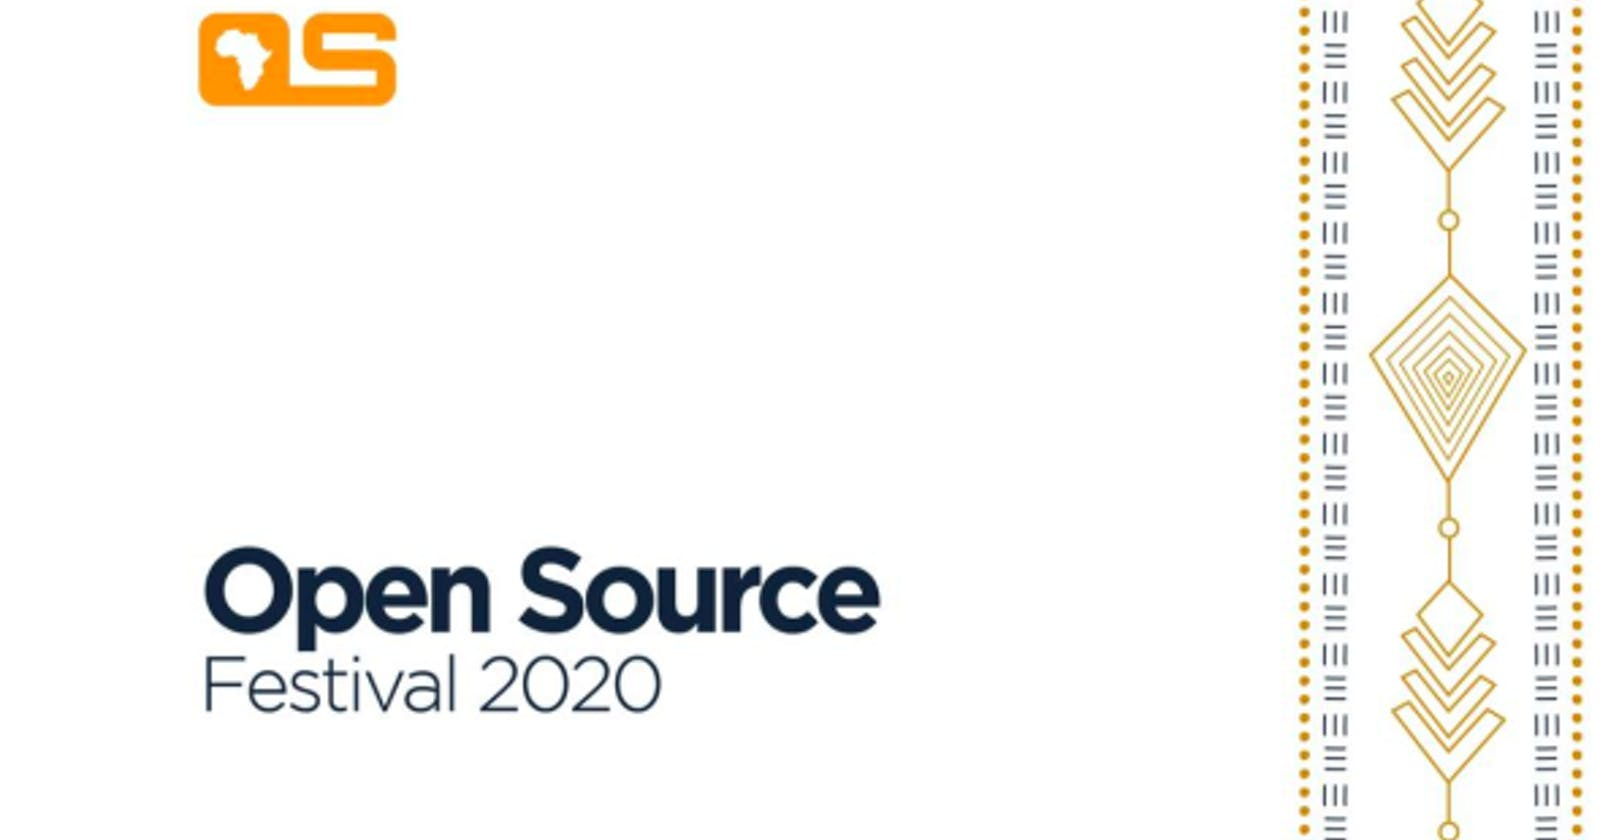 Announcing: Open Source Festival 2020 🎉🎉